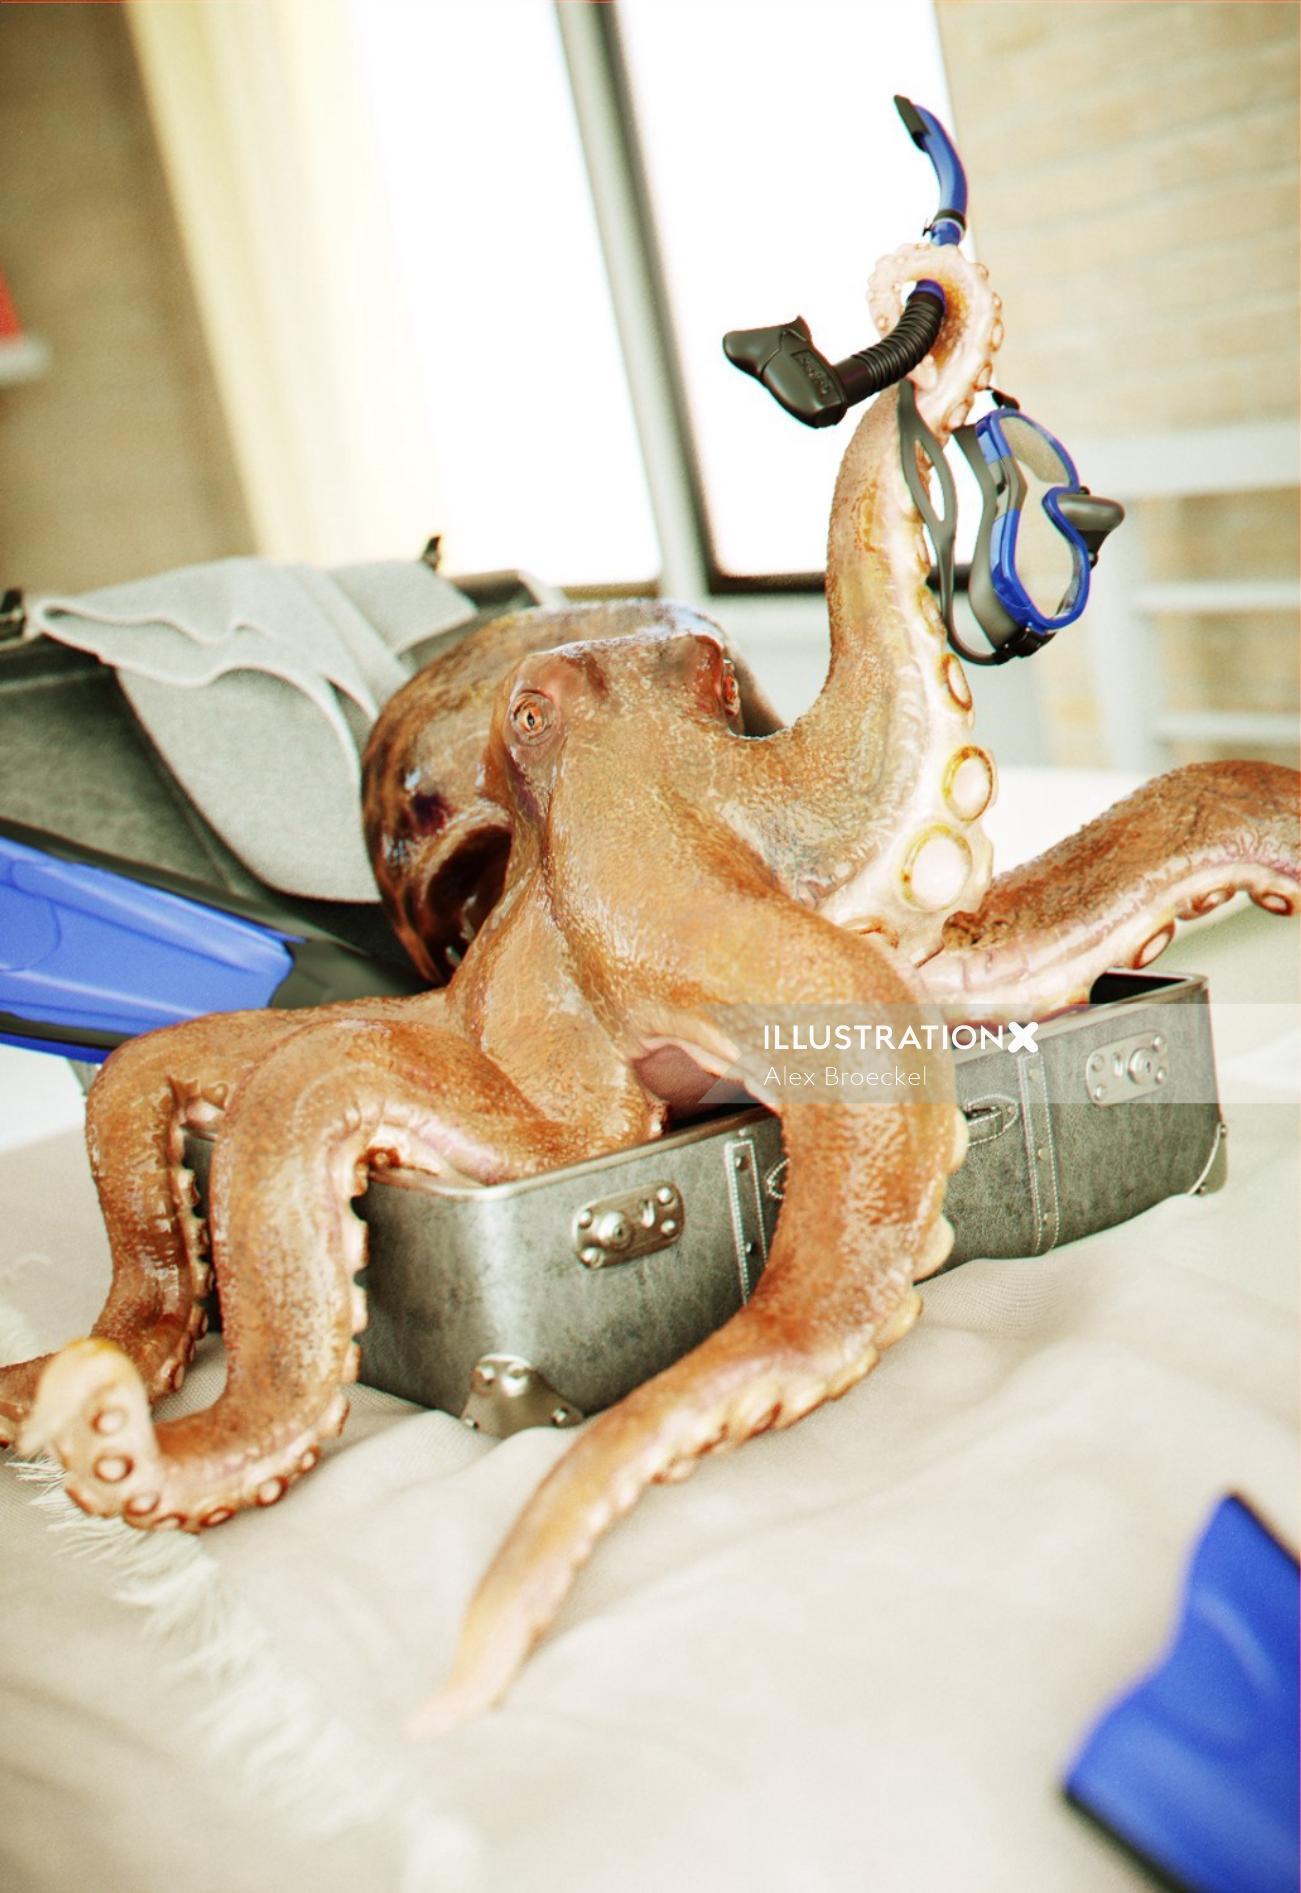 Photorealistic Illustration of Octopus